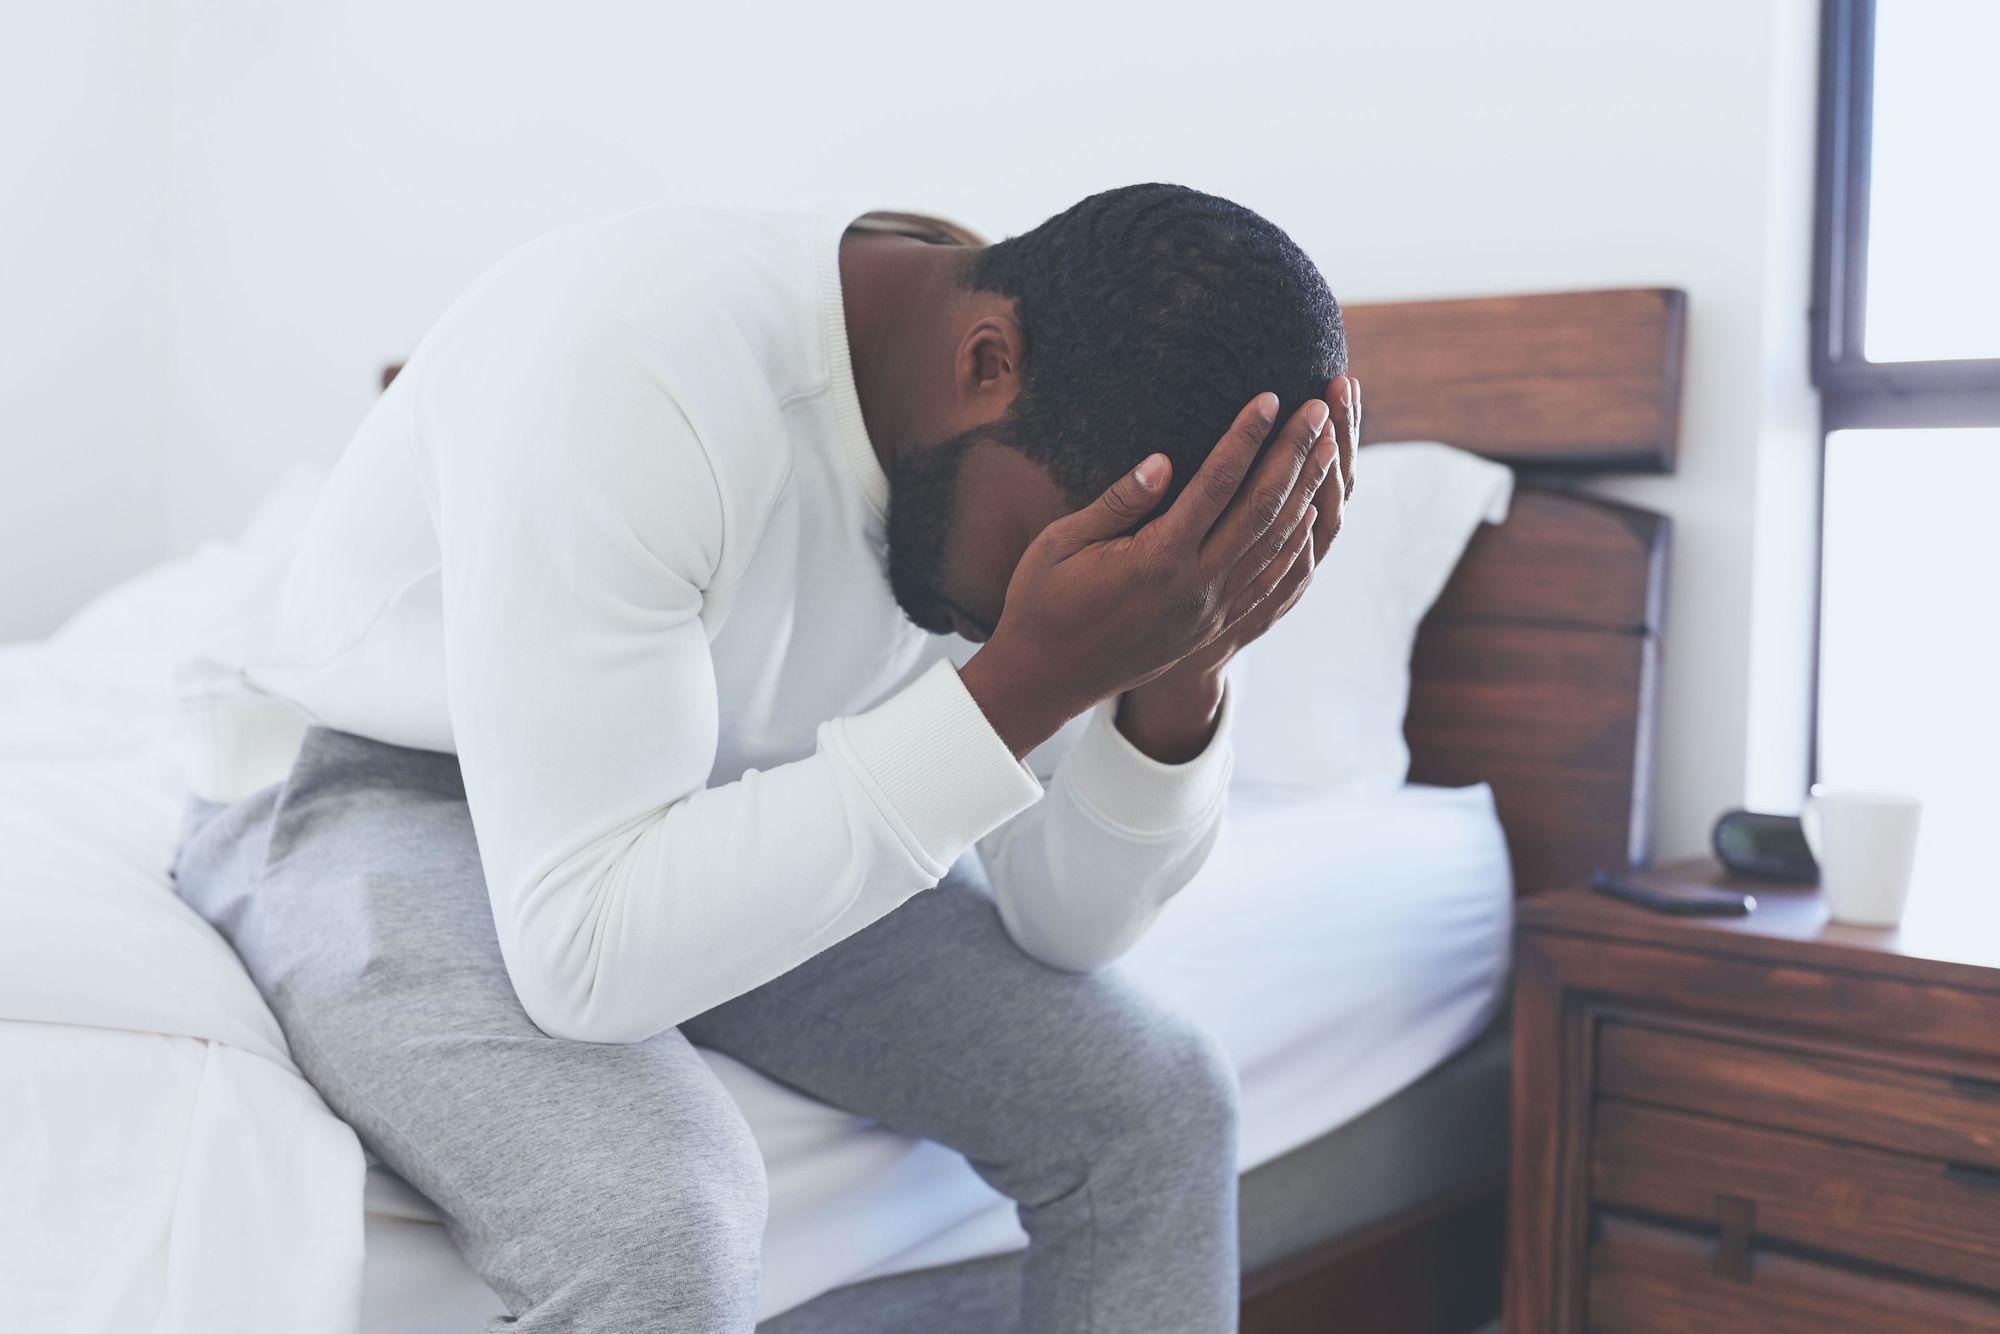 Man stressed